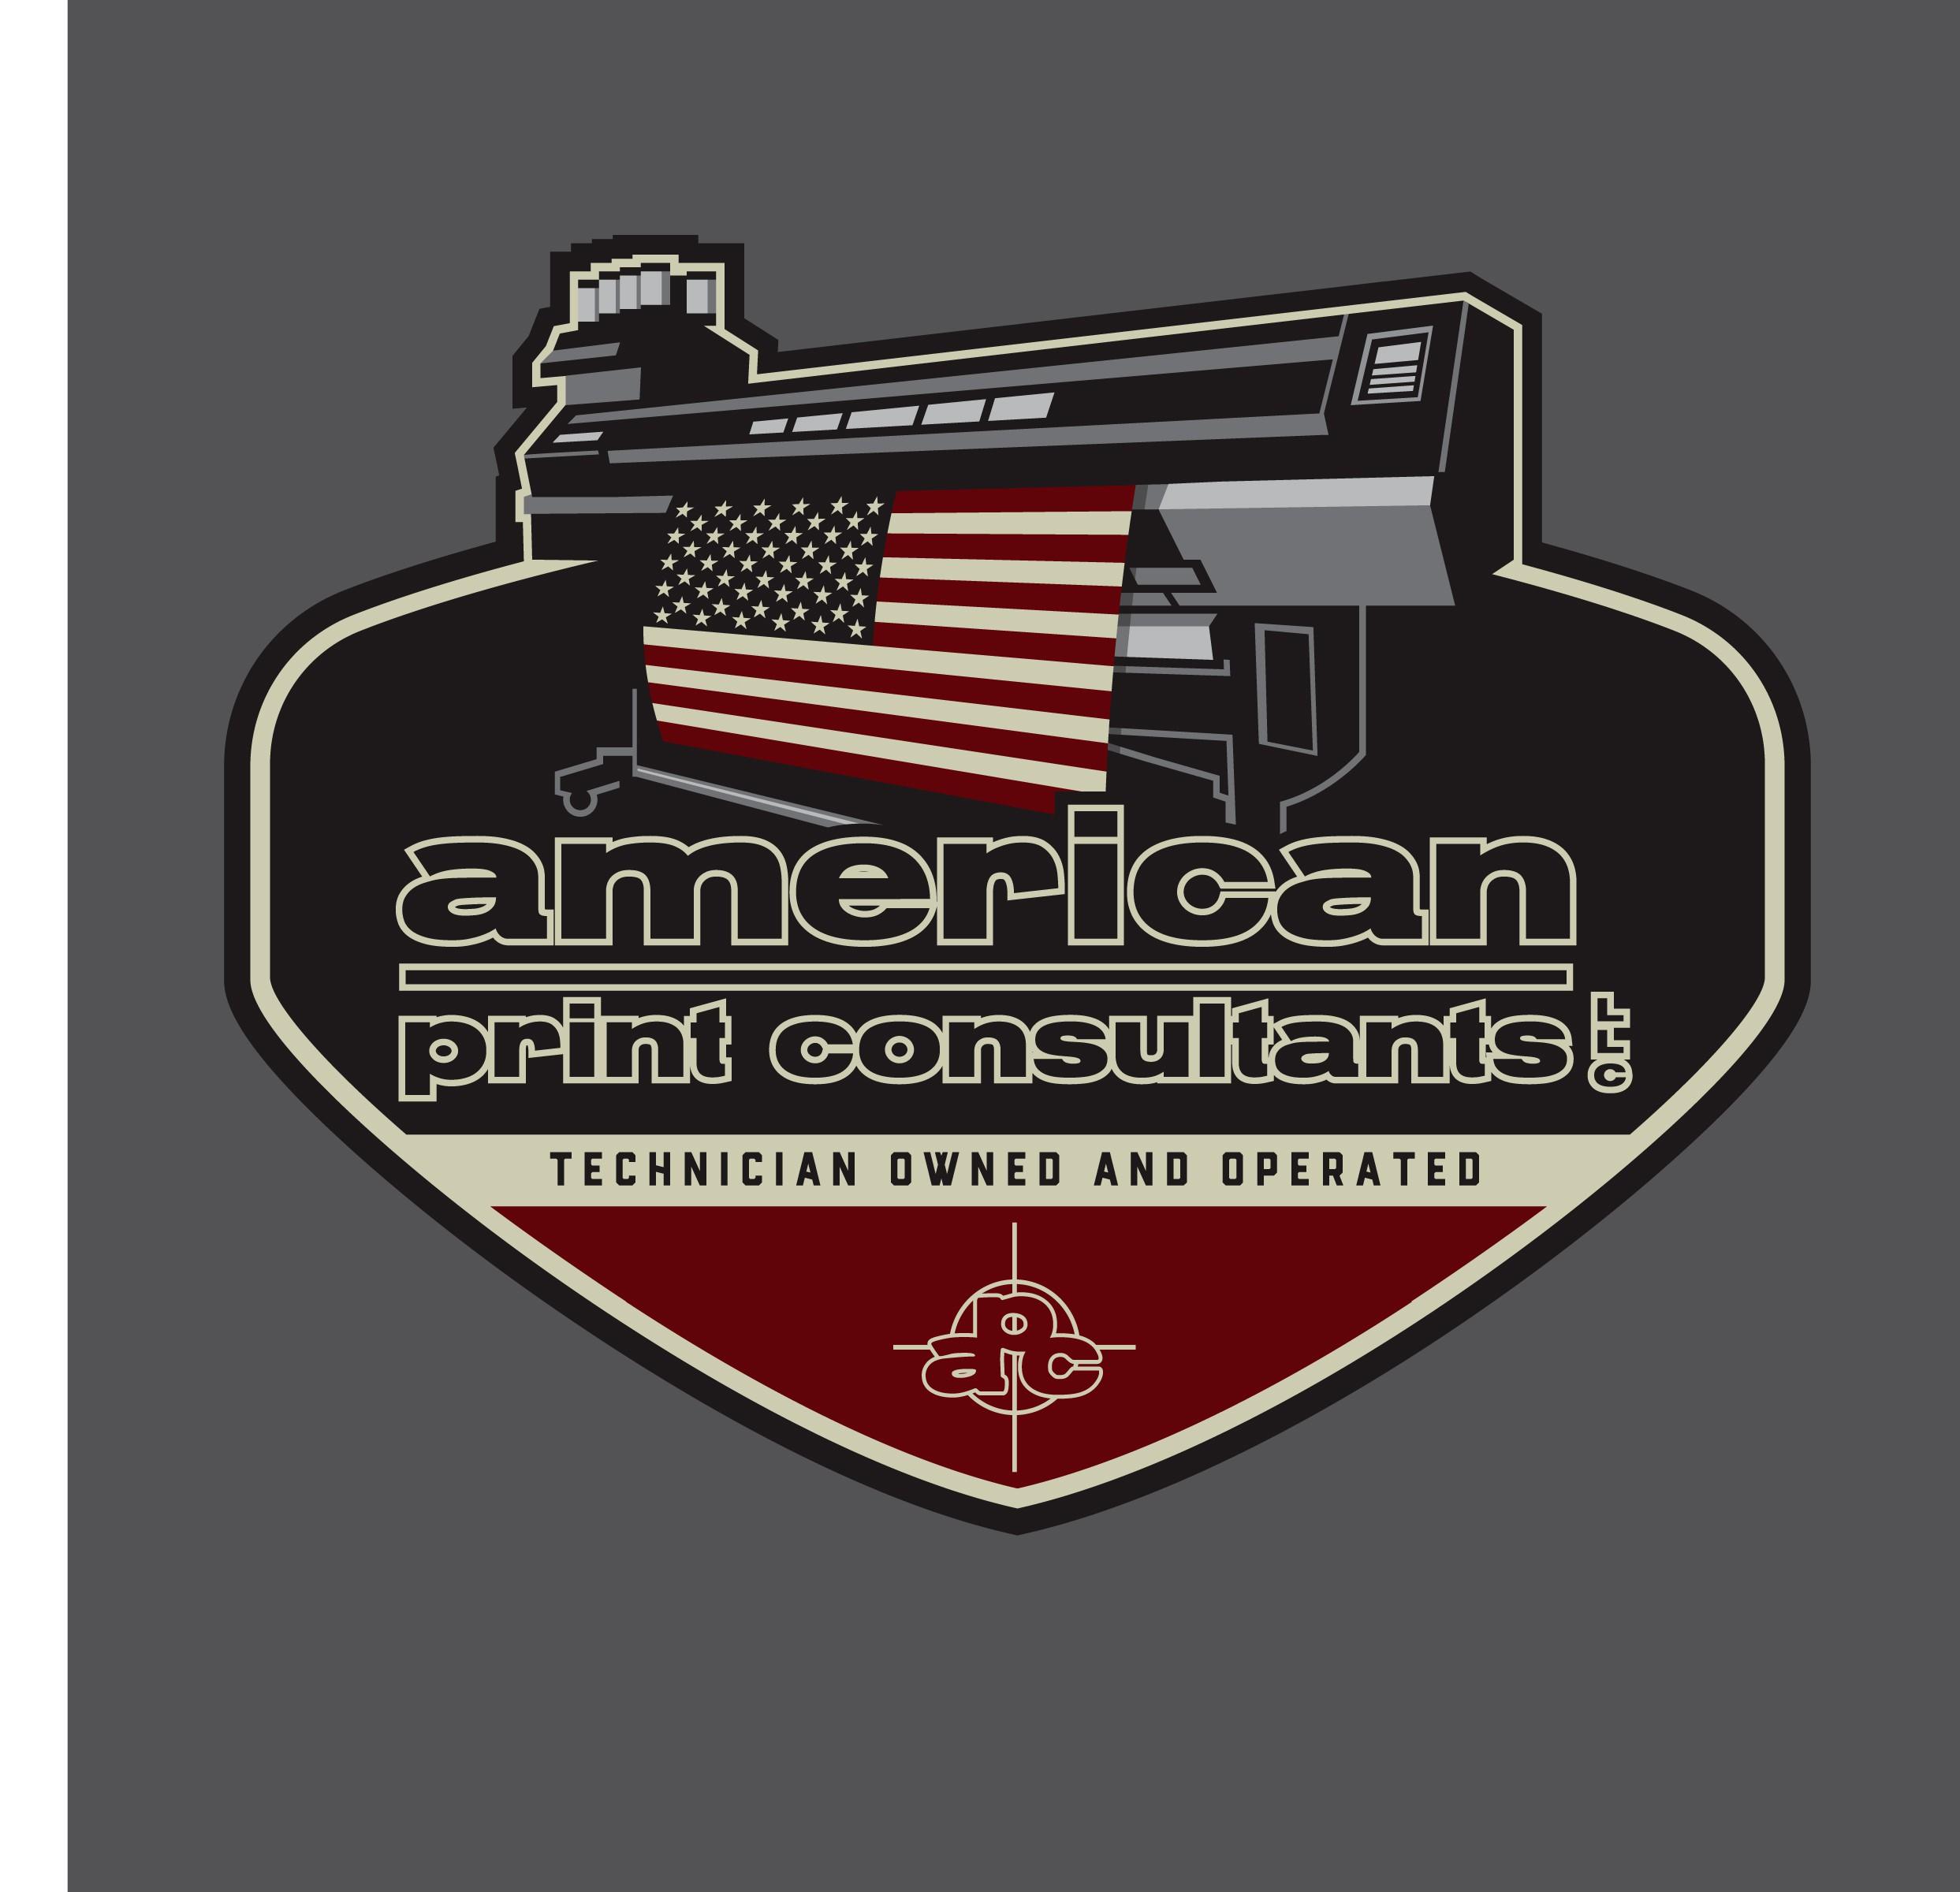 Vintage/Retro Garage Style Logo for our Printer Technicians